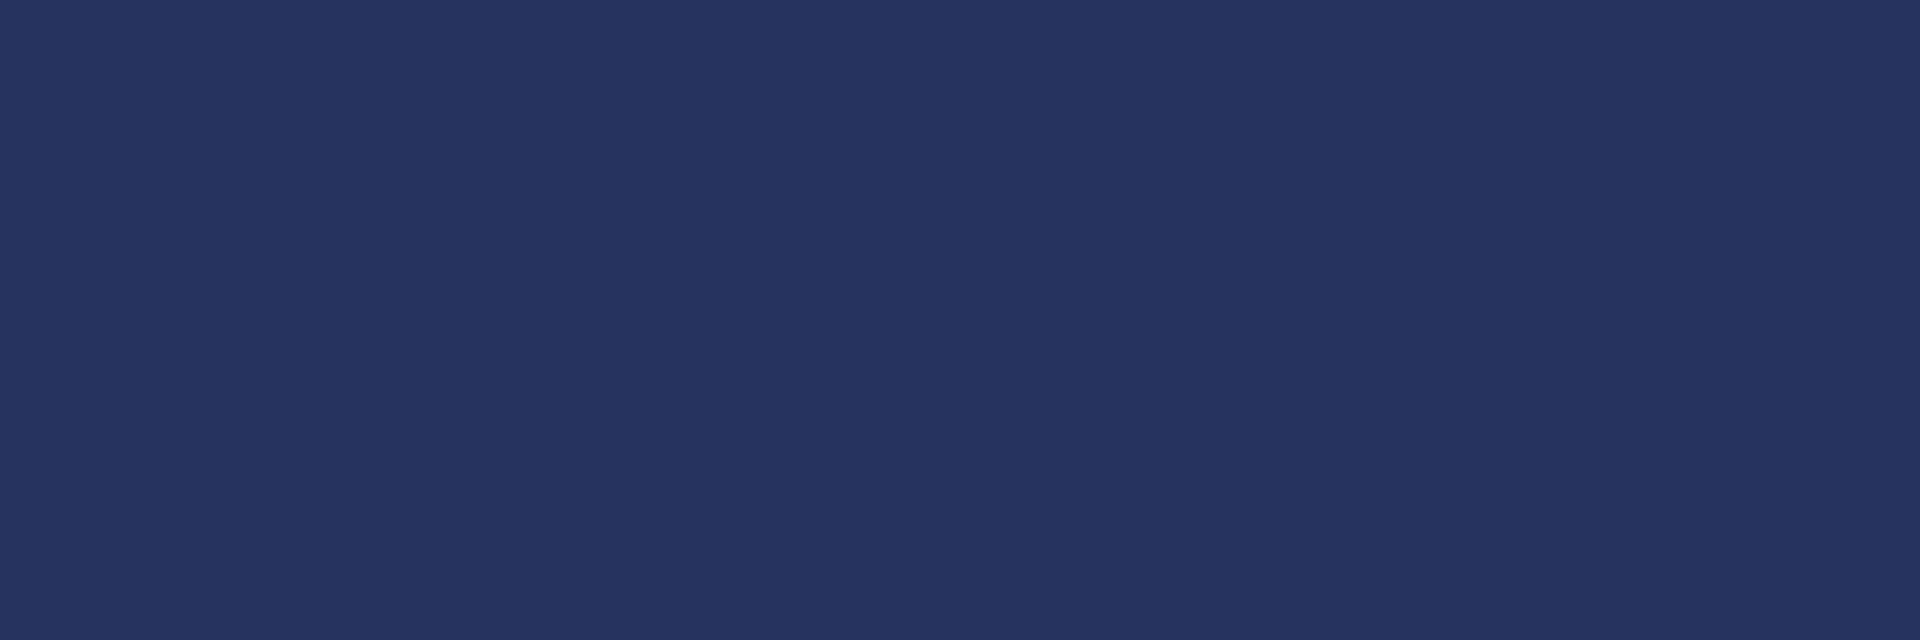 Landingpage_Bg-bannerblock_1200x400.png